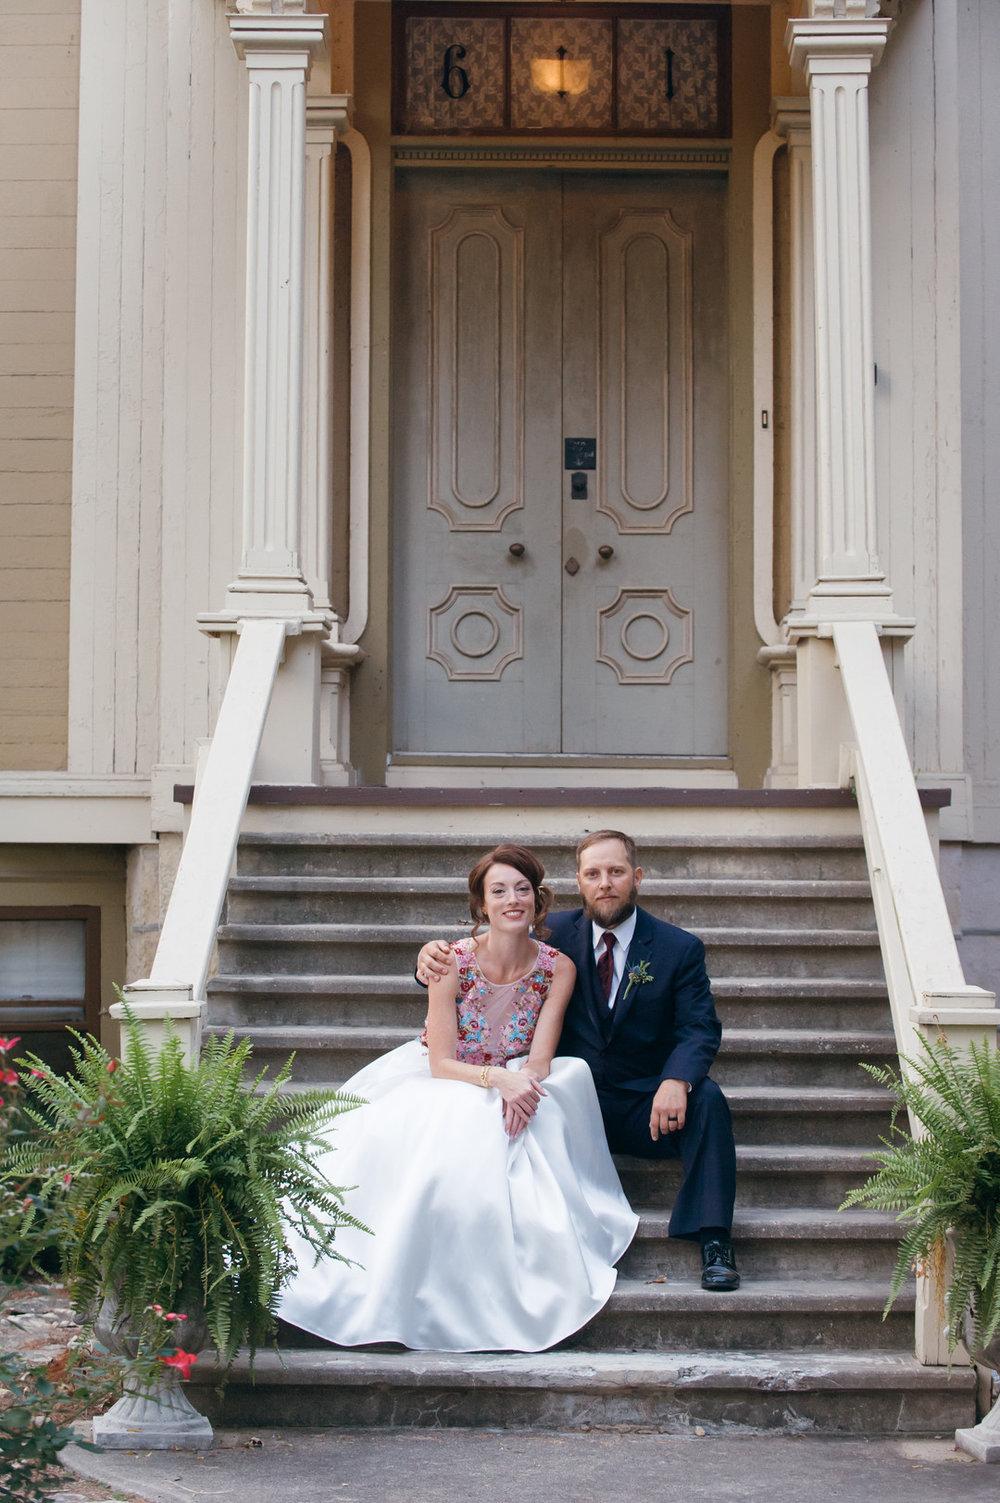 Vintage Bride and Groom Portrait Chicago Wedding Elite Photography